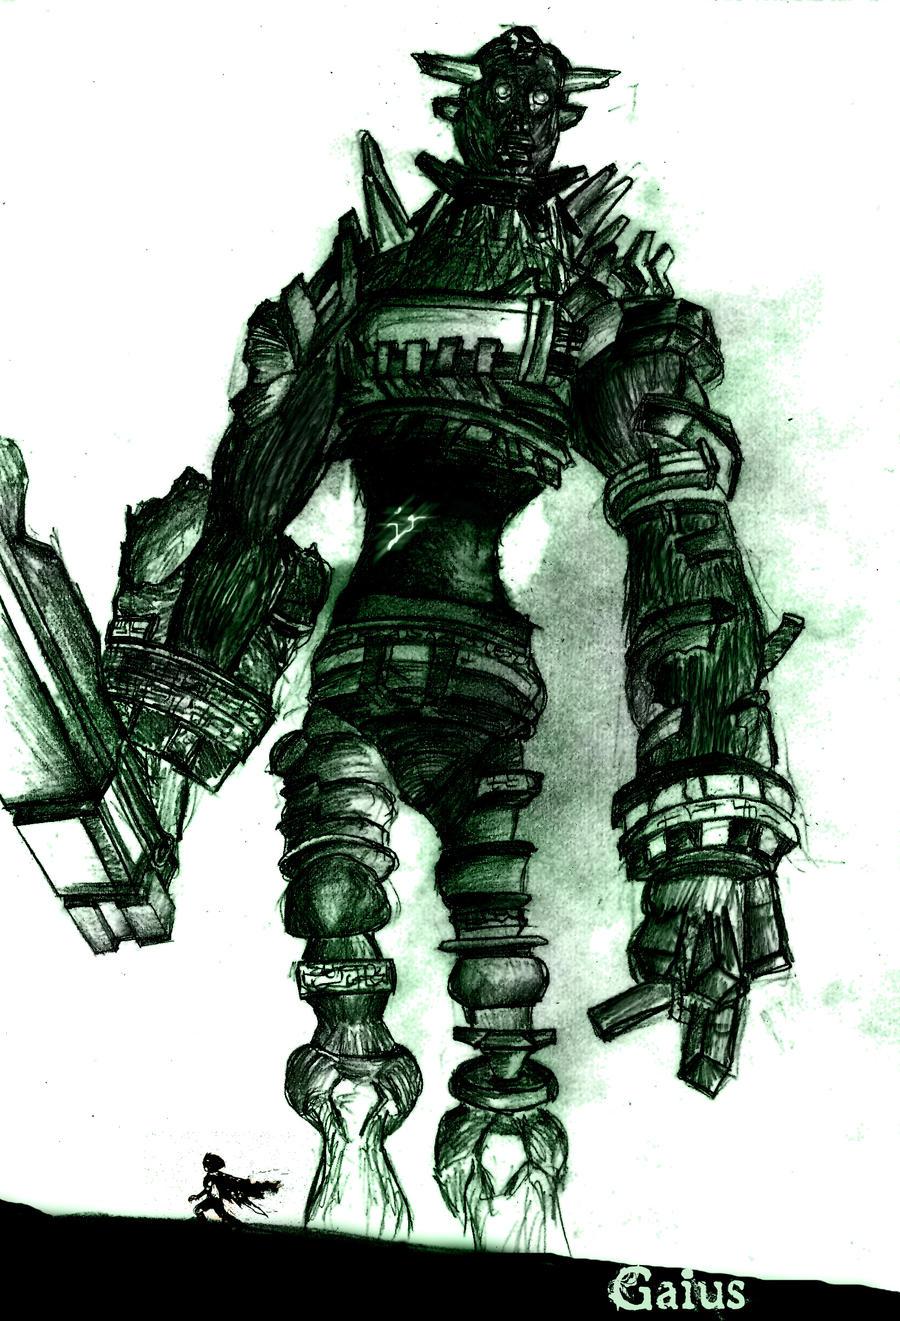 Gaius Shadow of the Colossus by Torvoraptor on DeviantArt